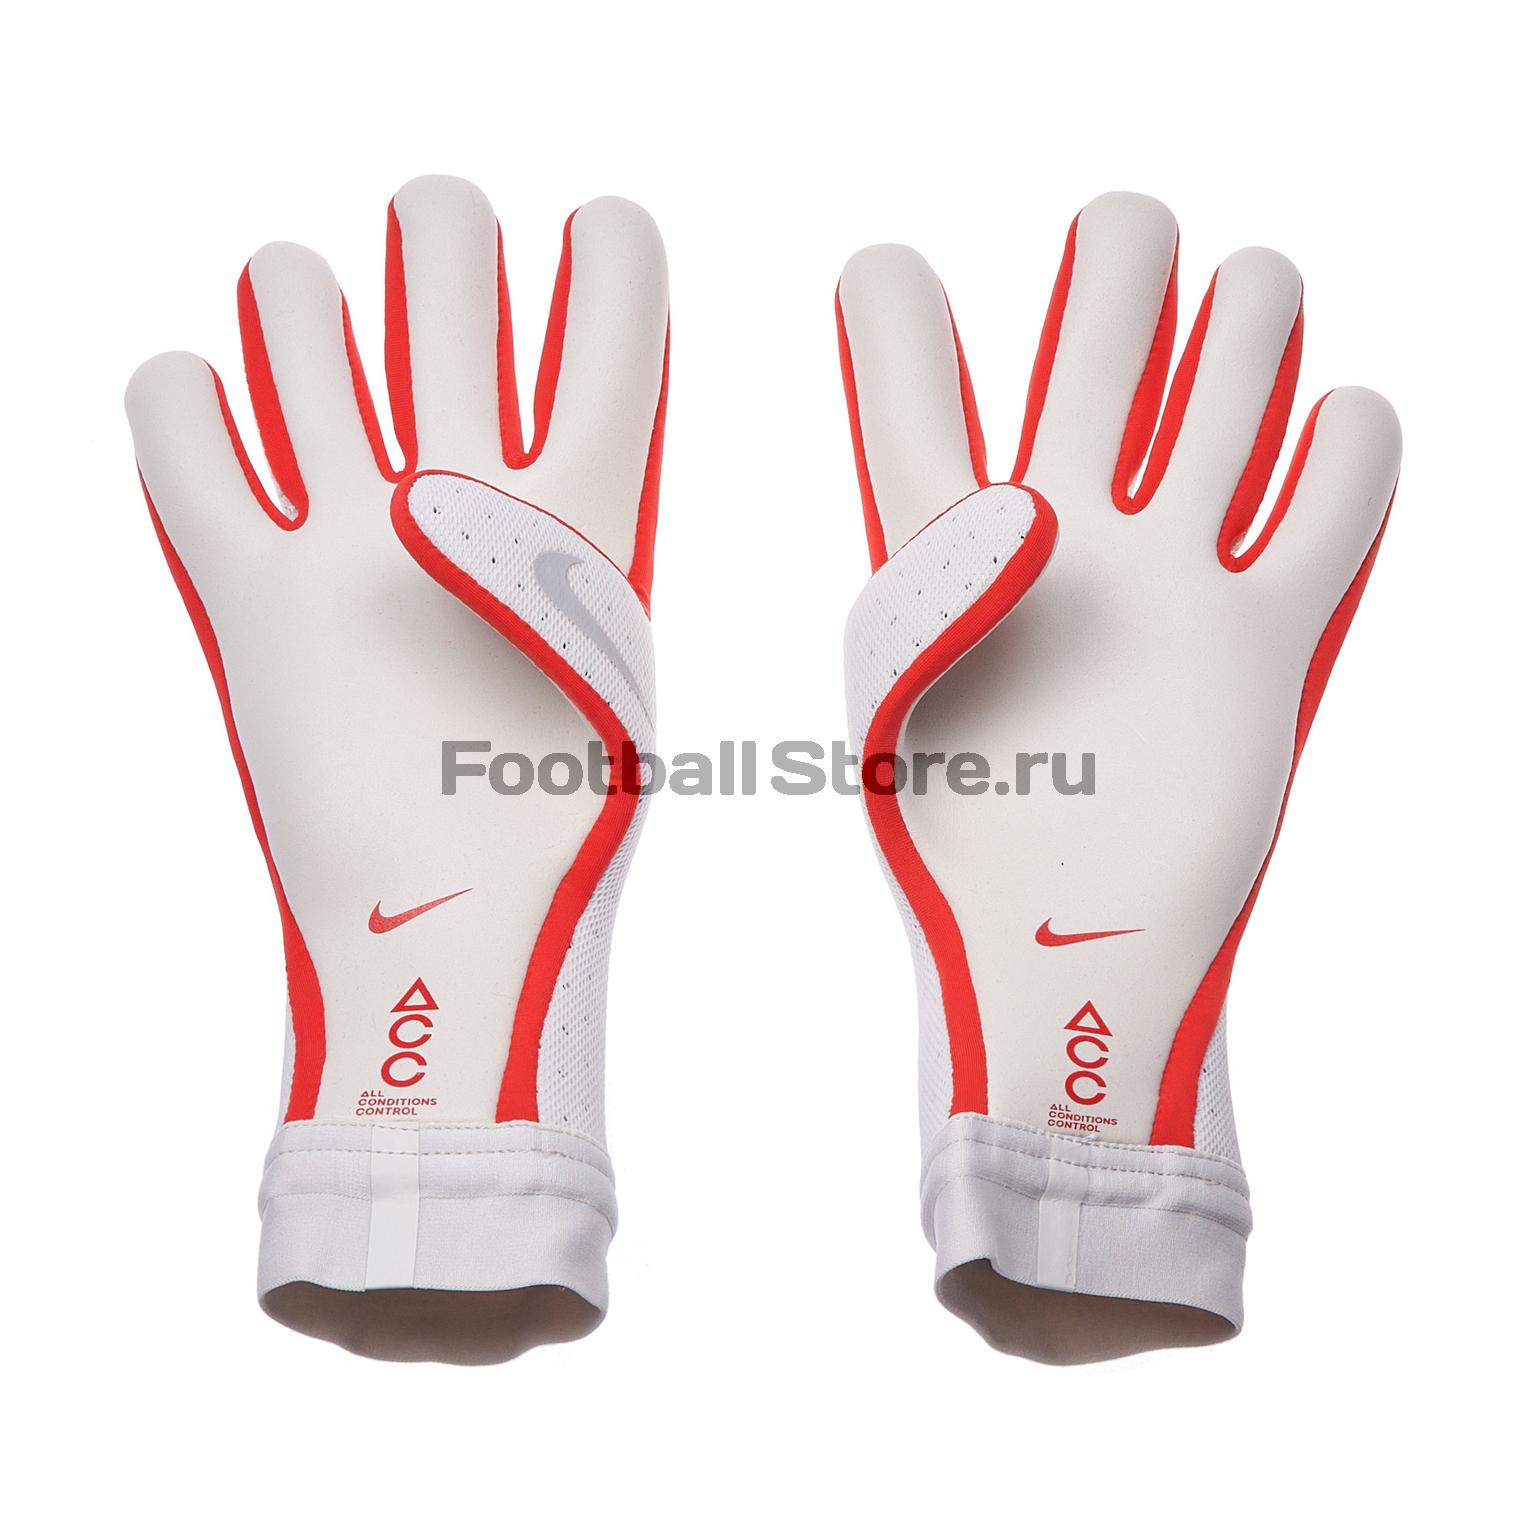 ... Перчатки вратарские Nike GK Mercurial Touch Elite GS0356-043. О ТОВАРЕ   РАСЧЕТ ДОСТАВКИ e8034b1bab8